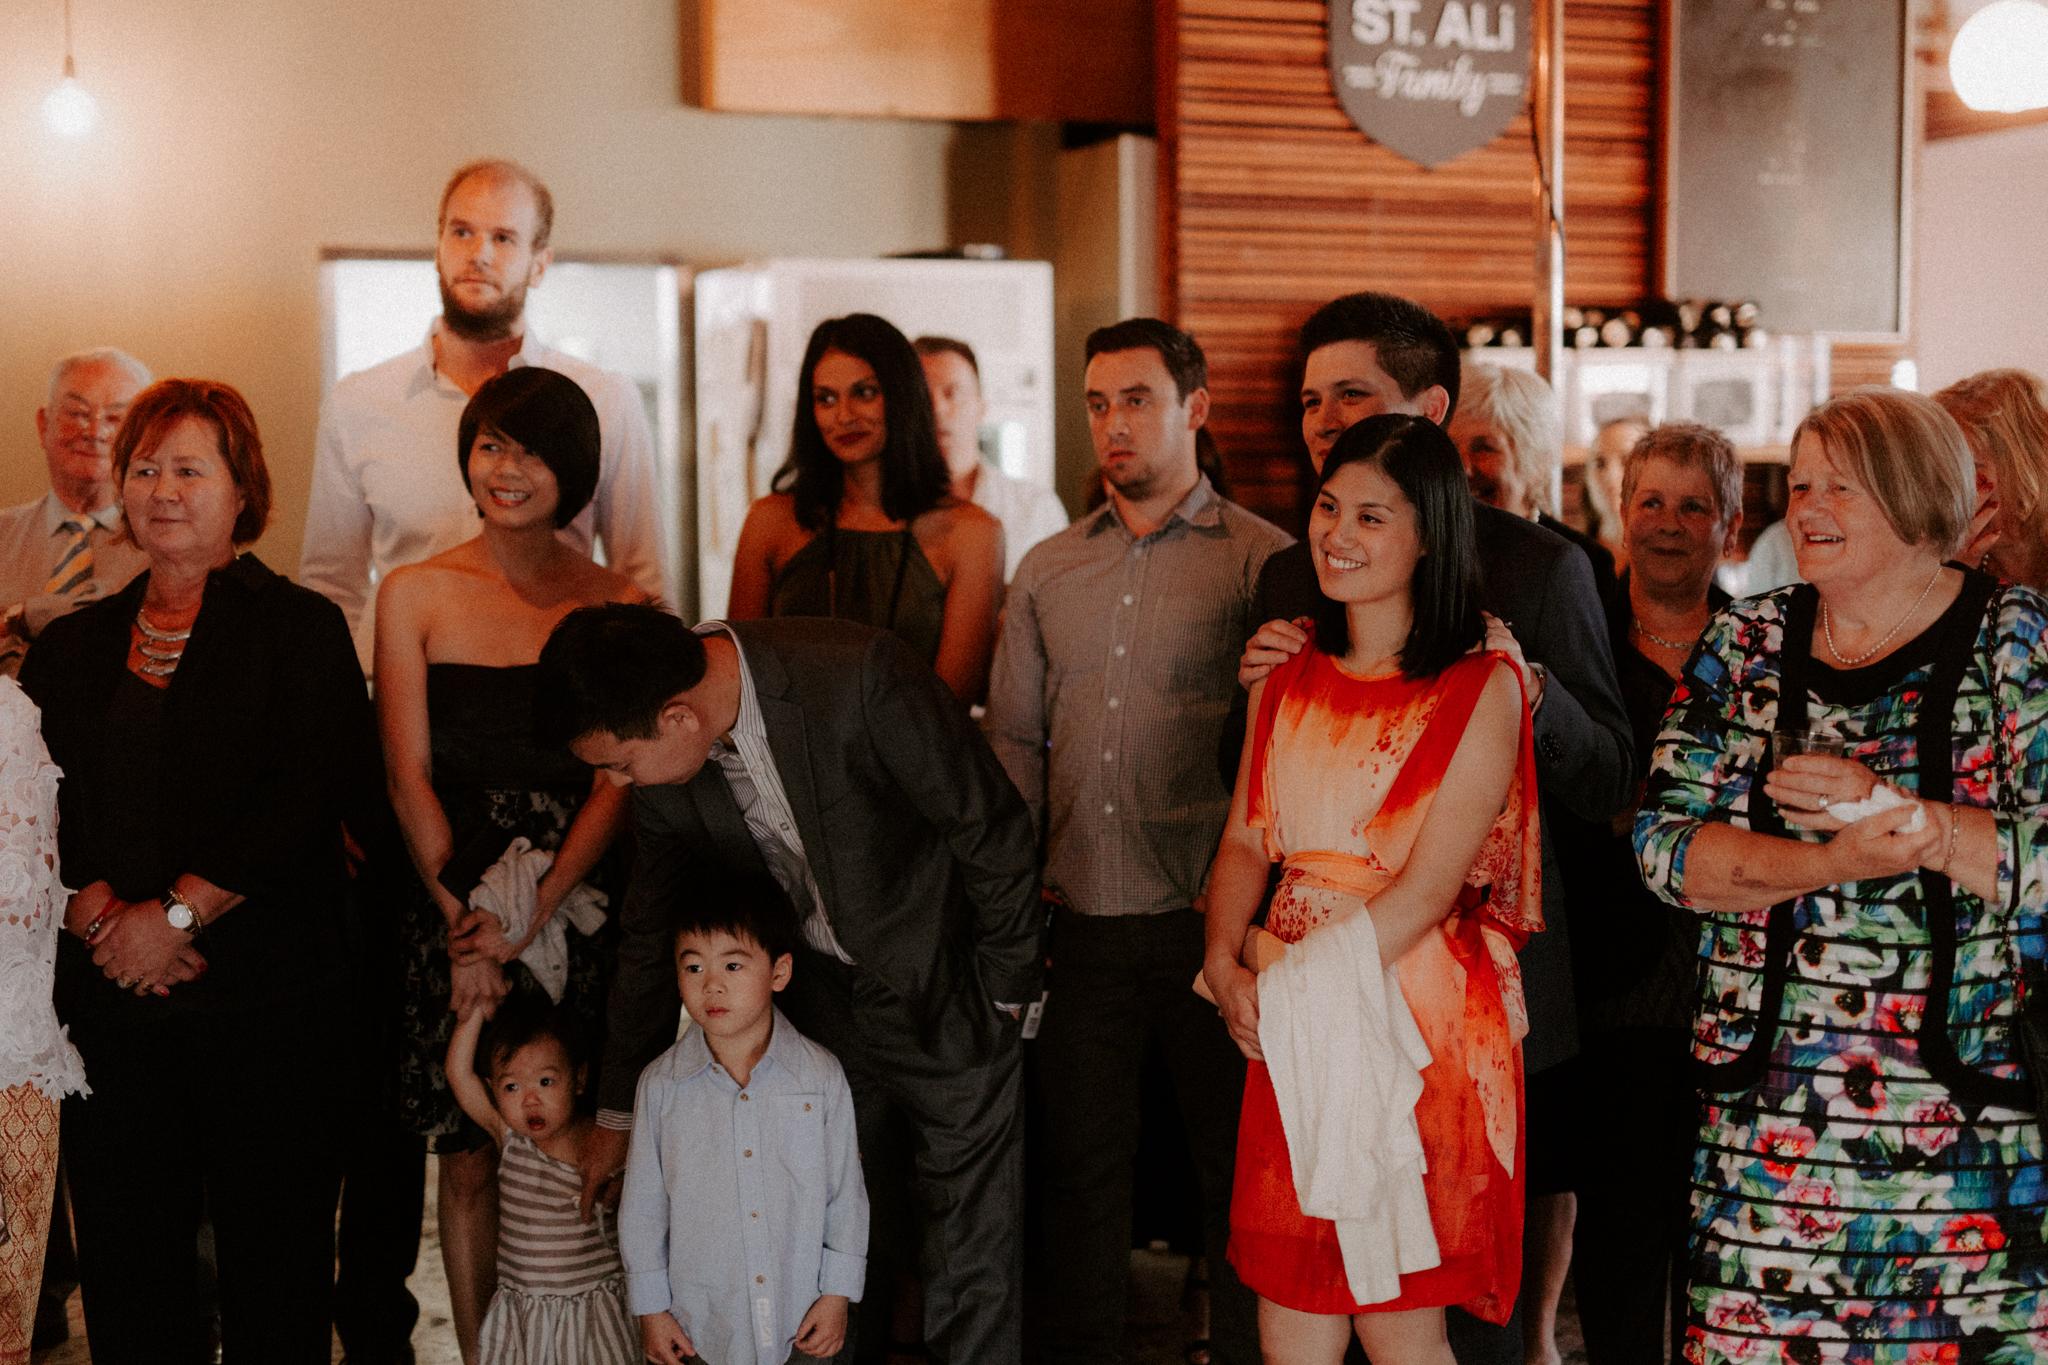 St-Ali-Wedding-Emotions-and-Math-Photography-031.jpg